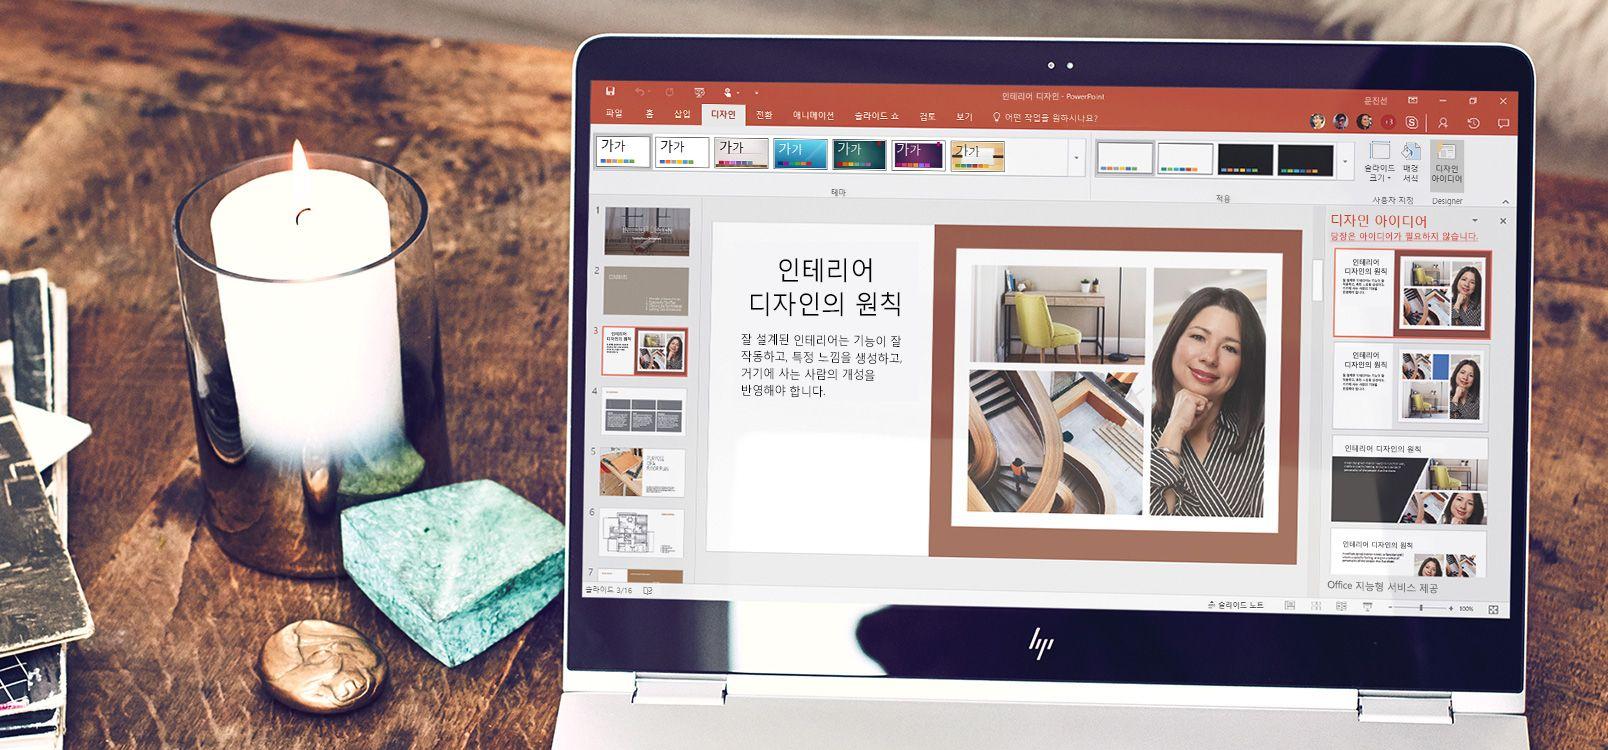 PowerPoint Designer 기능을 사용하여 PowerPoint 문서를 보여주는 랩톱 화면